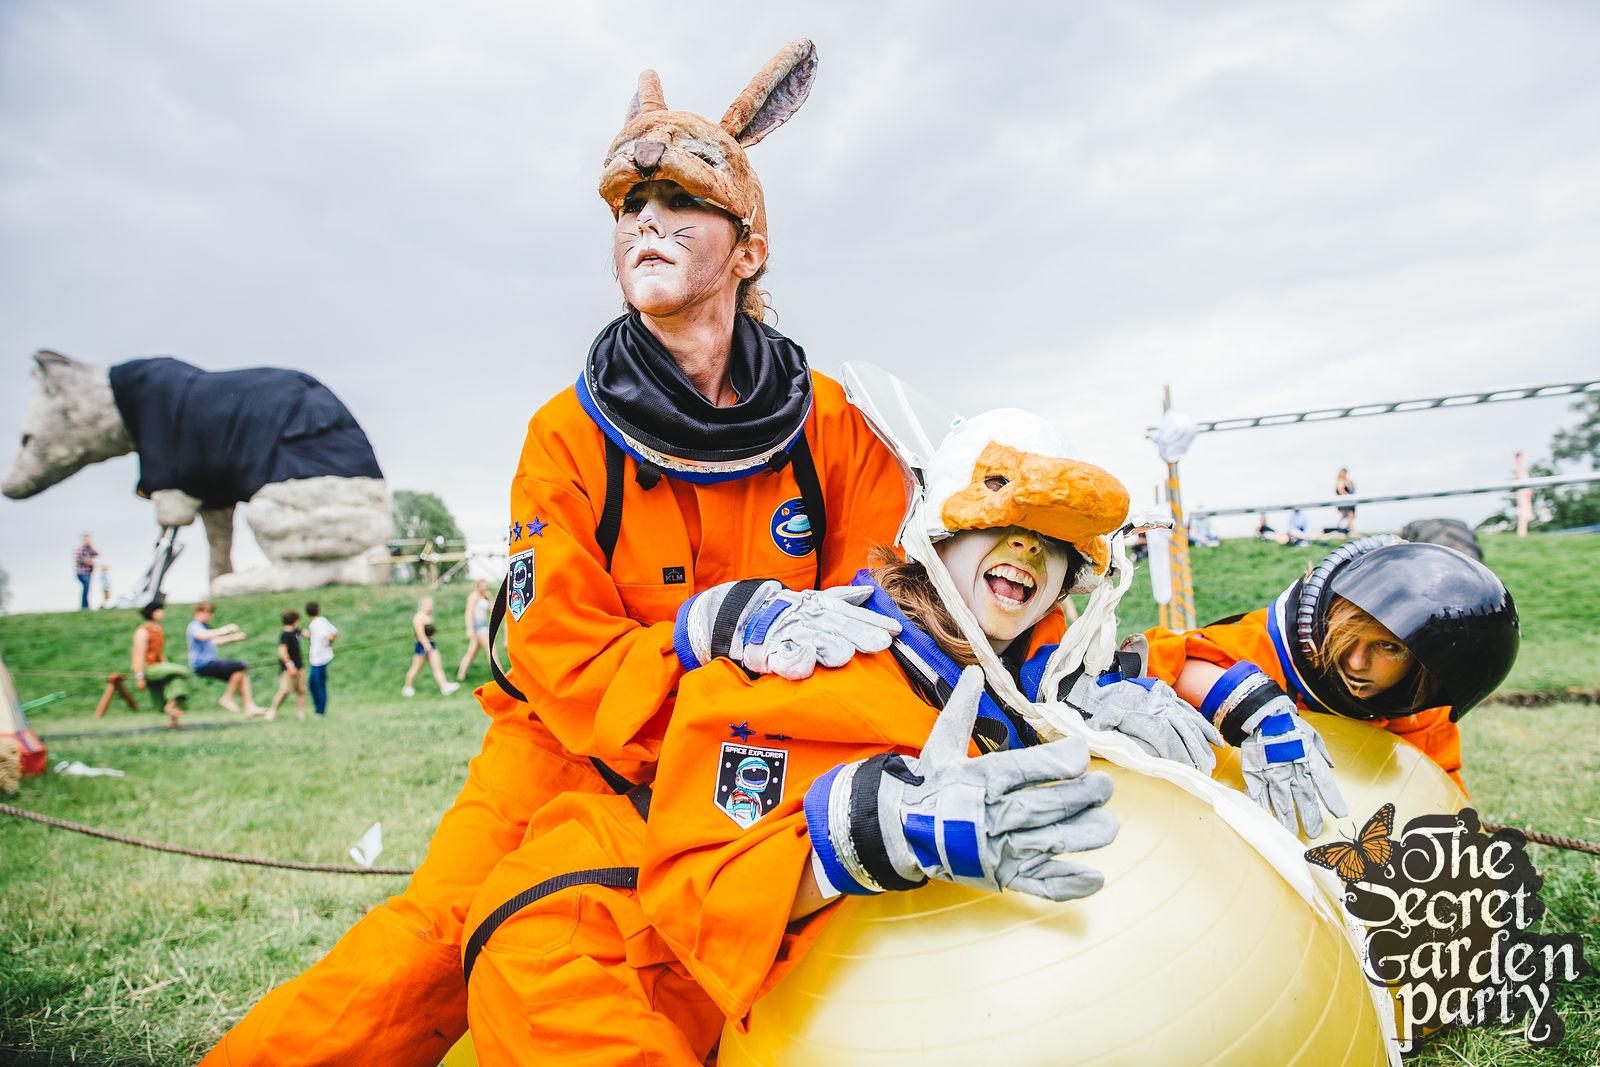 A.S.S. (Astronaut Survival School)